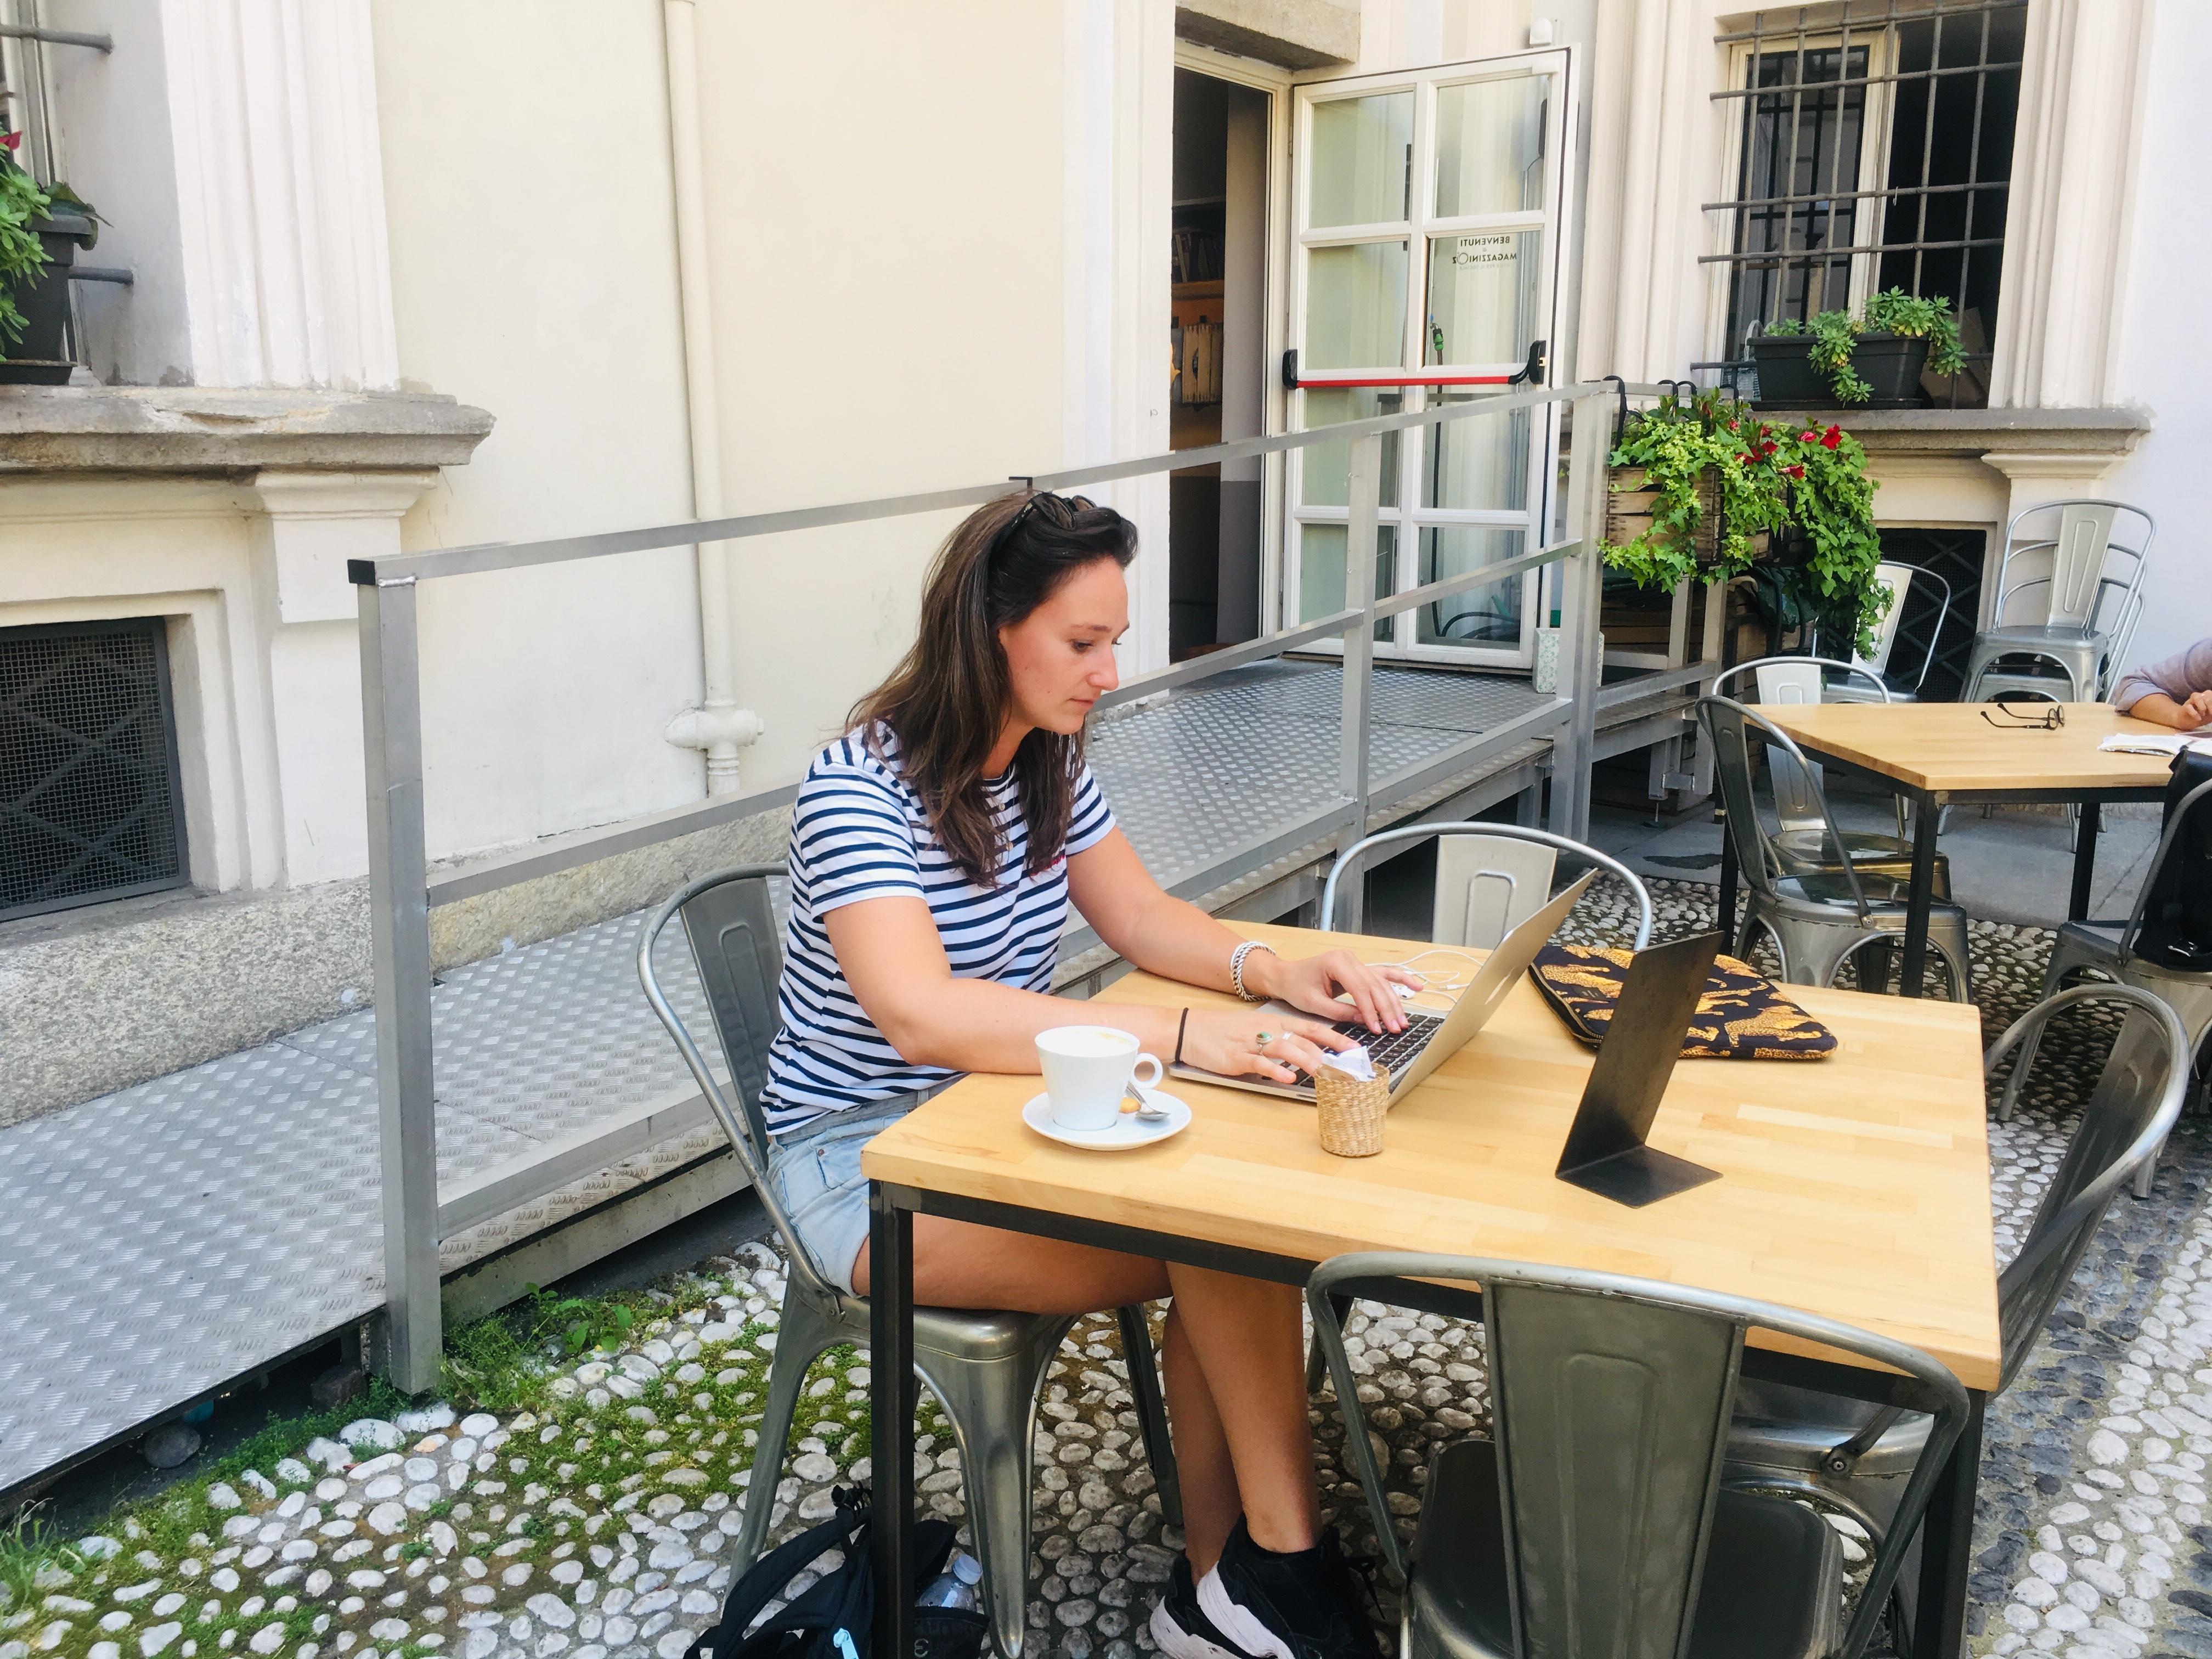 Laptopje openklappen bij Maggazini